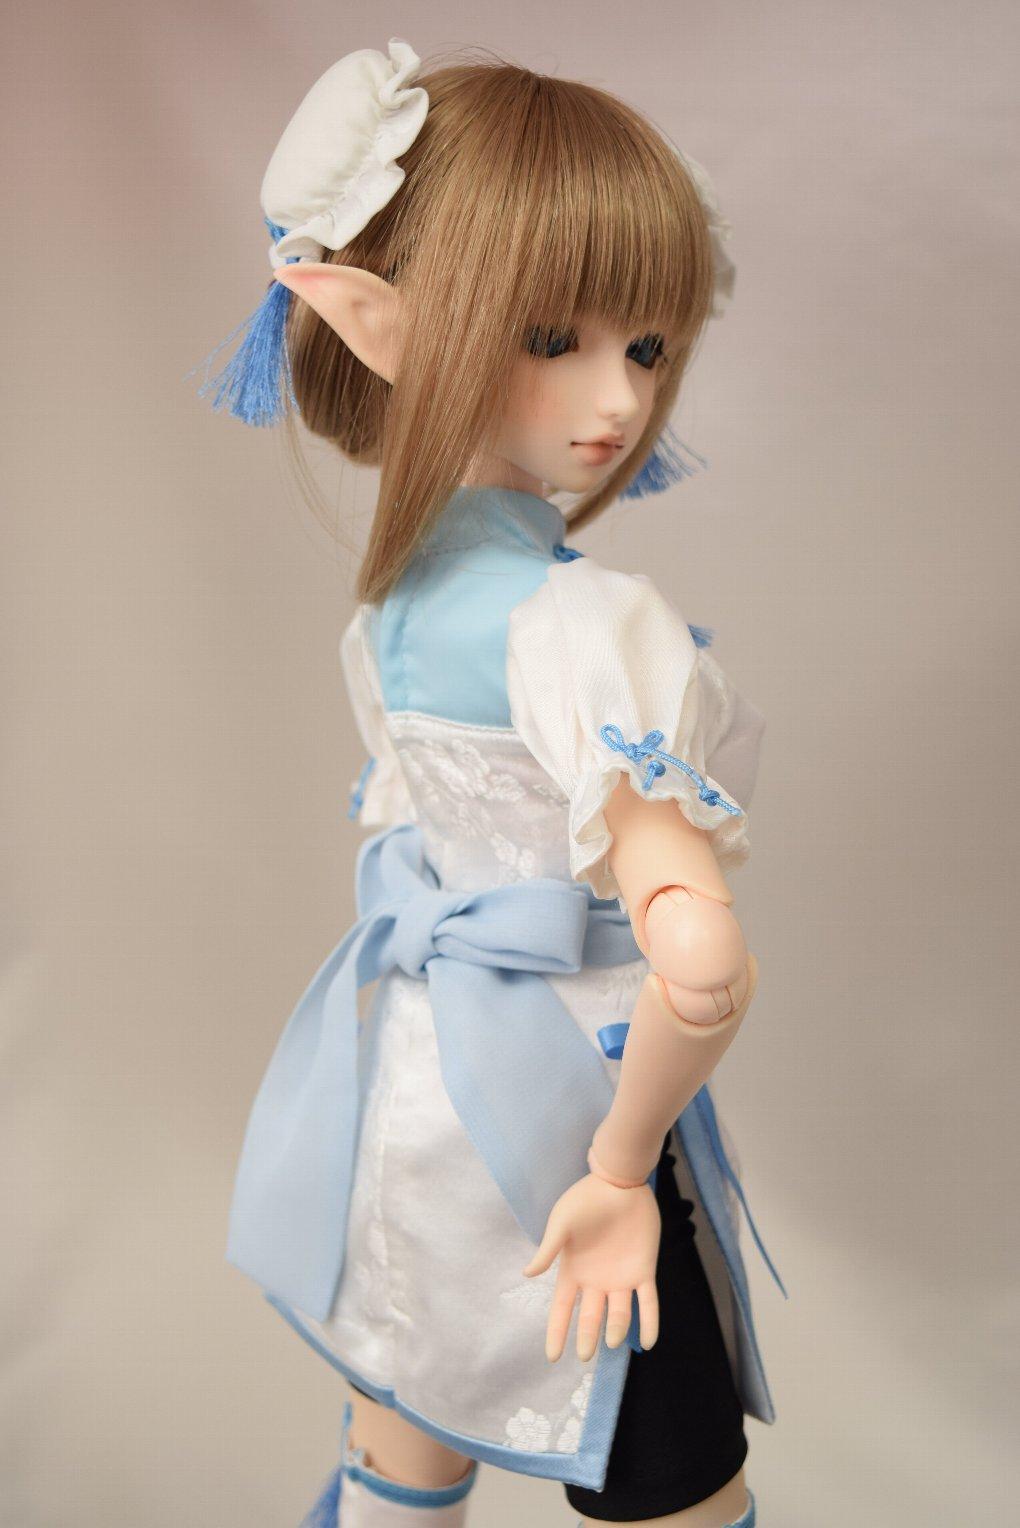 doll_3790.jpg